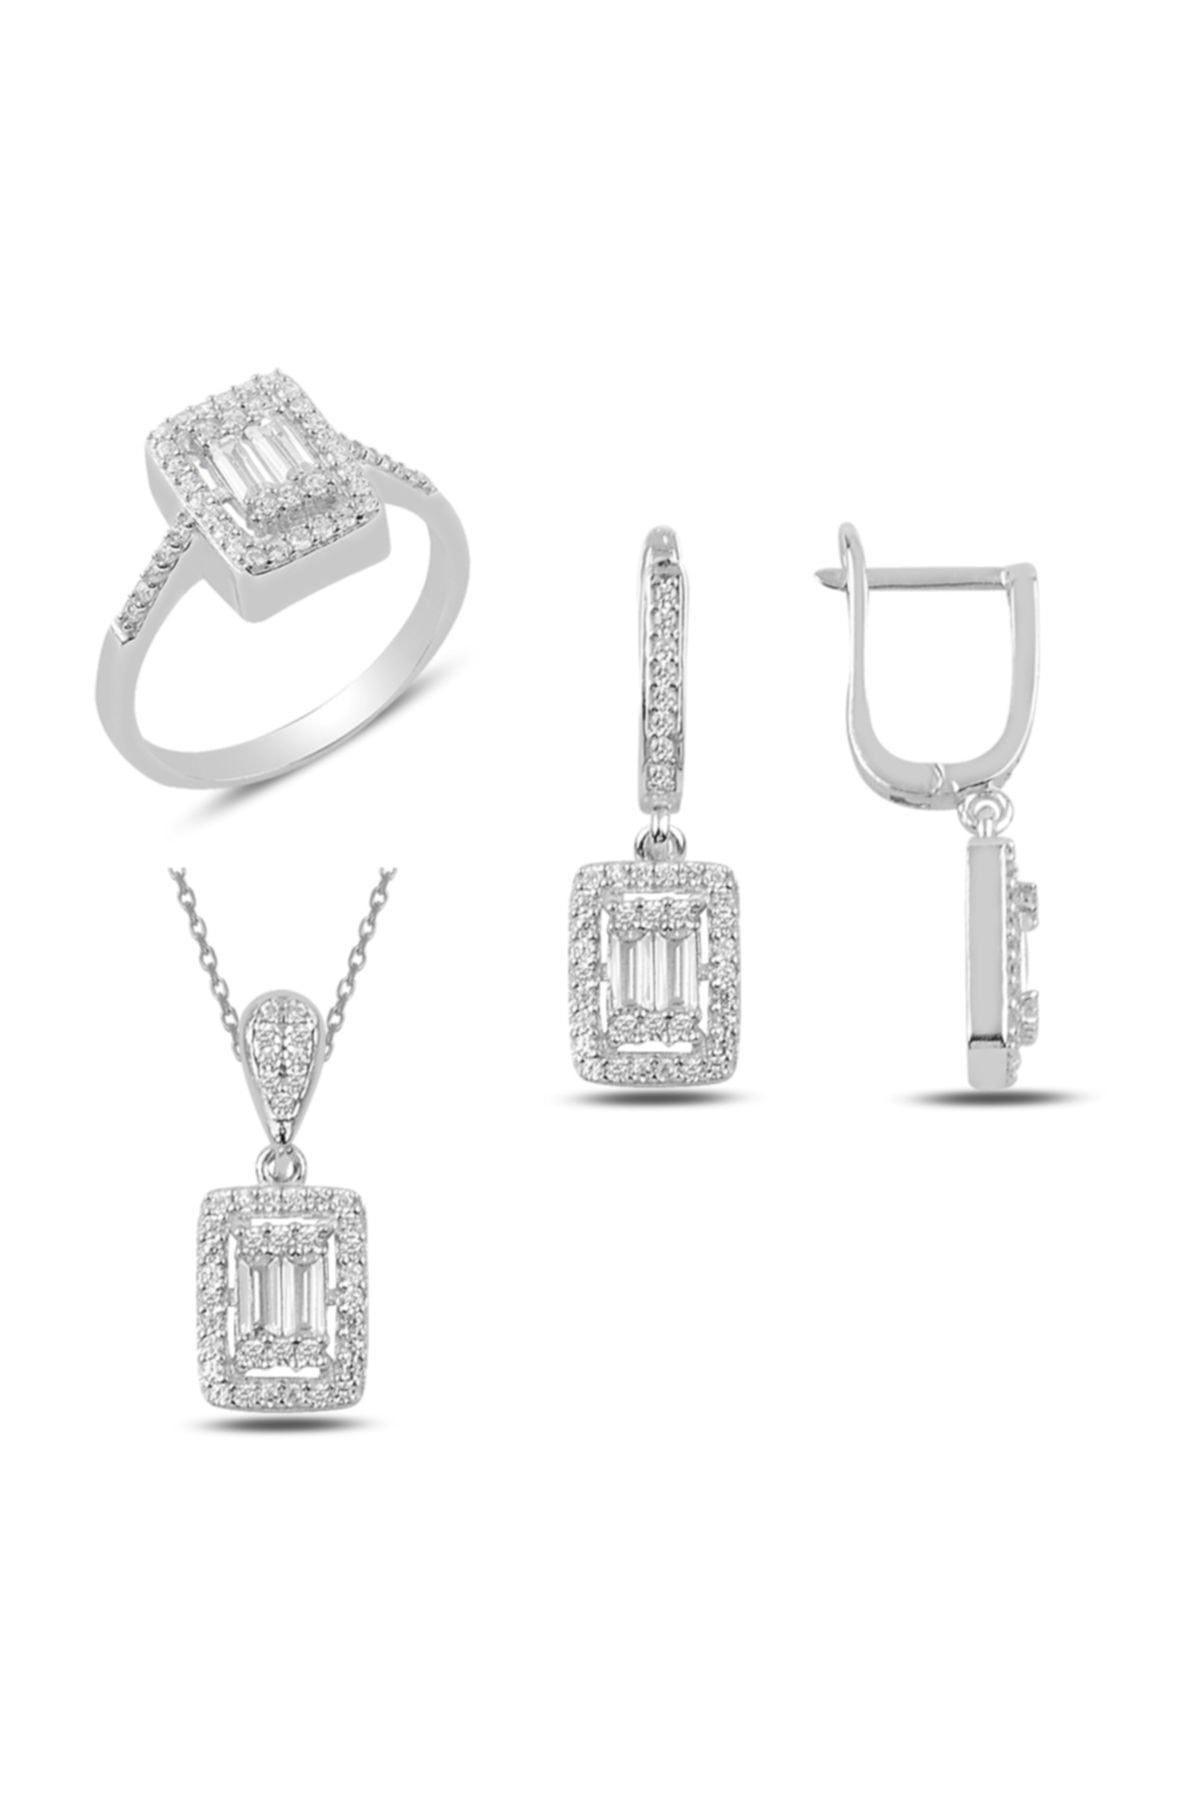 Mercan Silver Baget Taşlı Gümüş Set 1